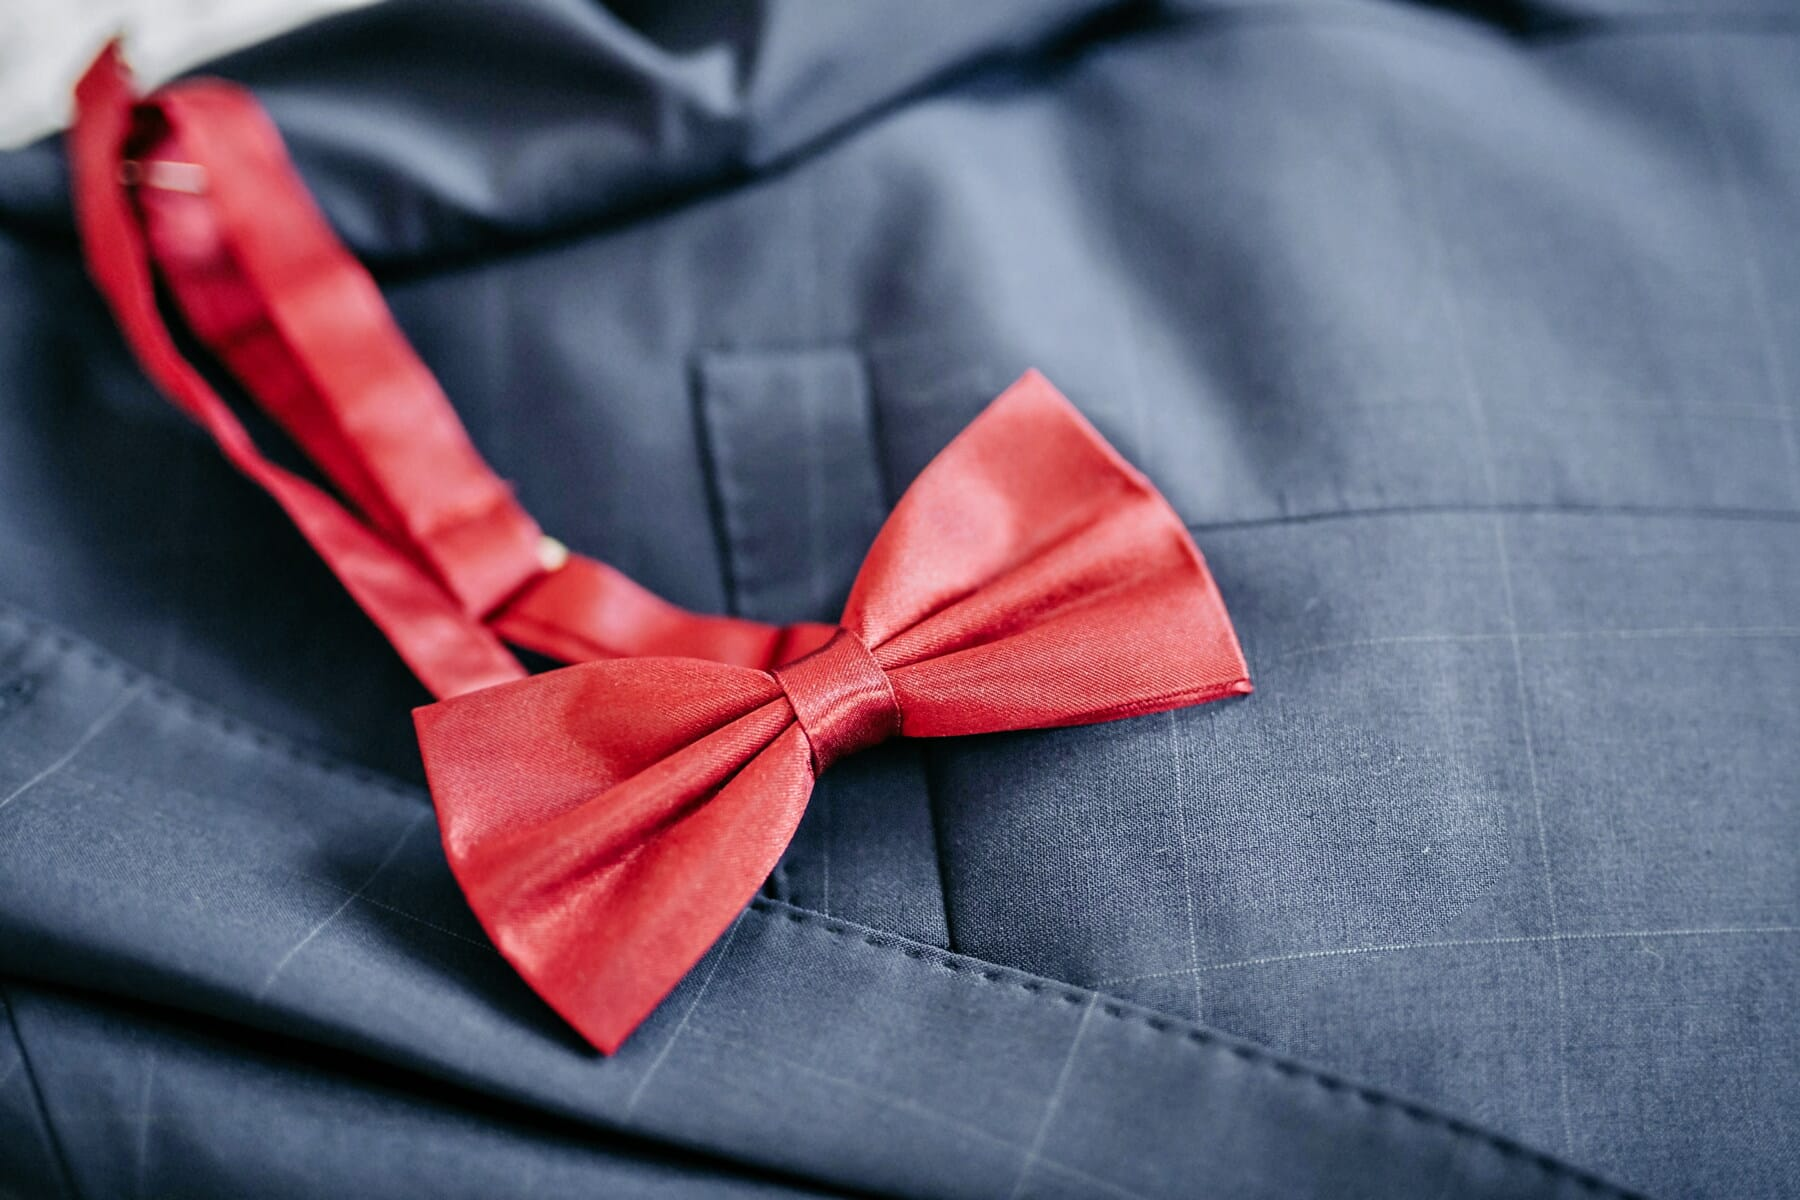 knot, red, tie, bowtie, detail, fashion, glamour, tuxedo suit, elegance, silk